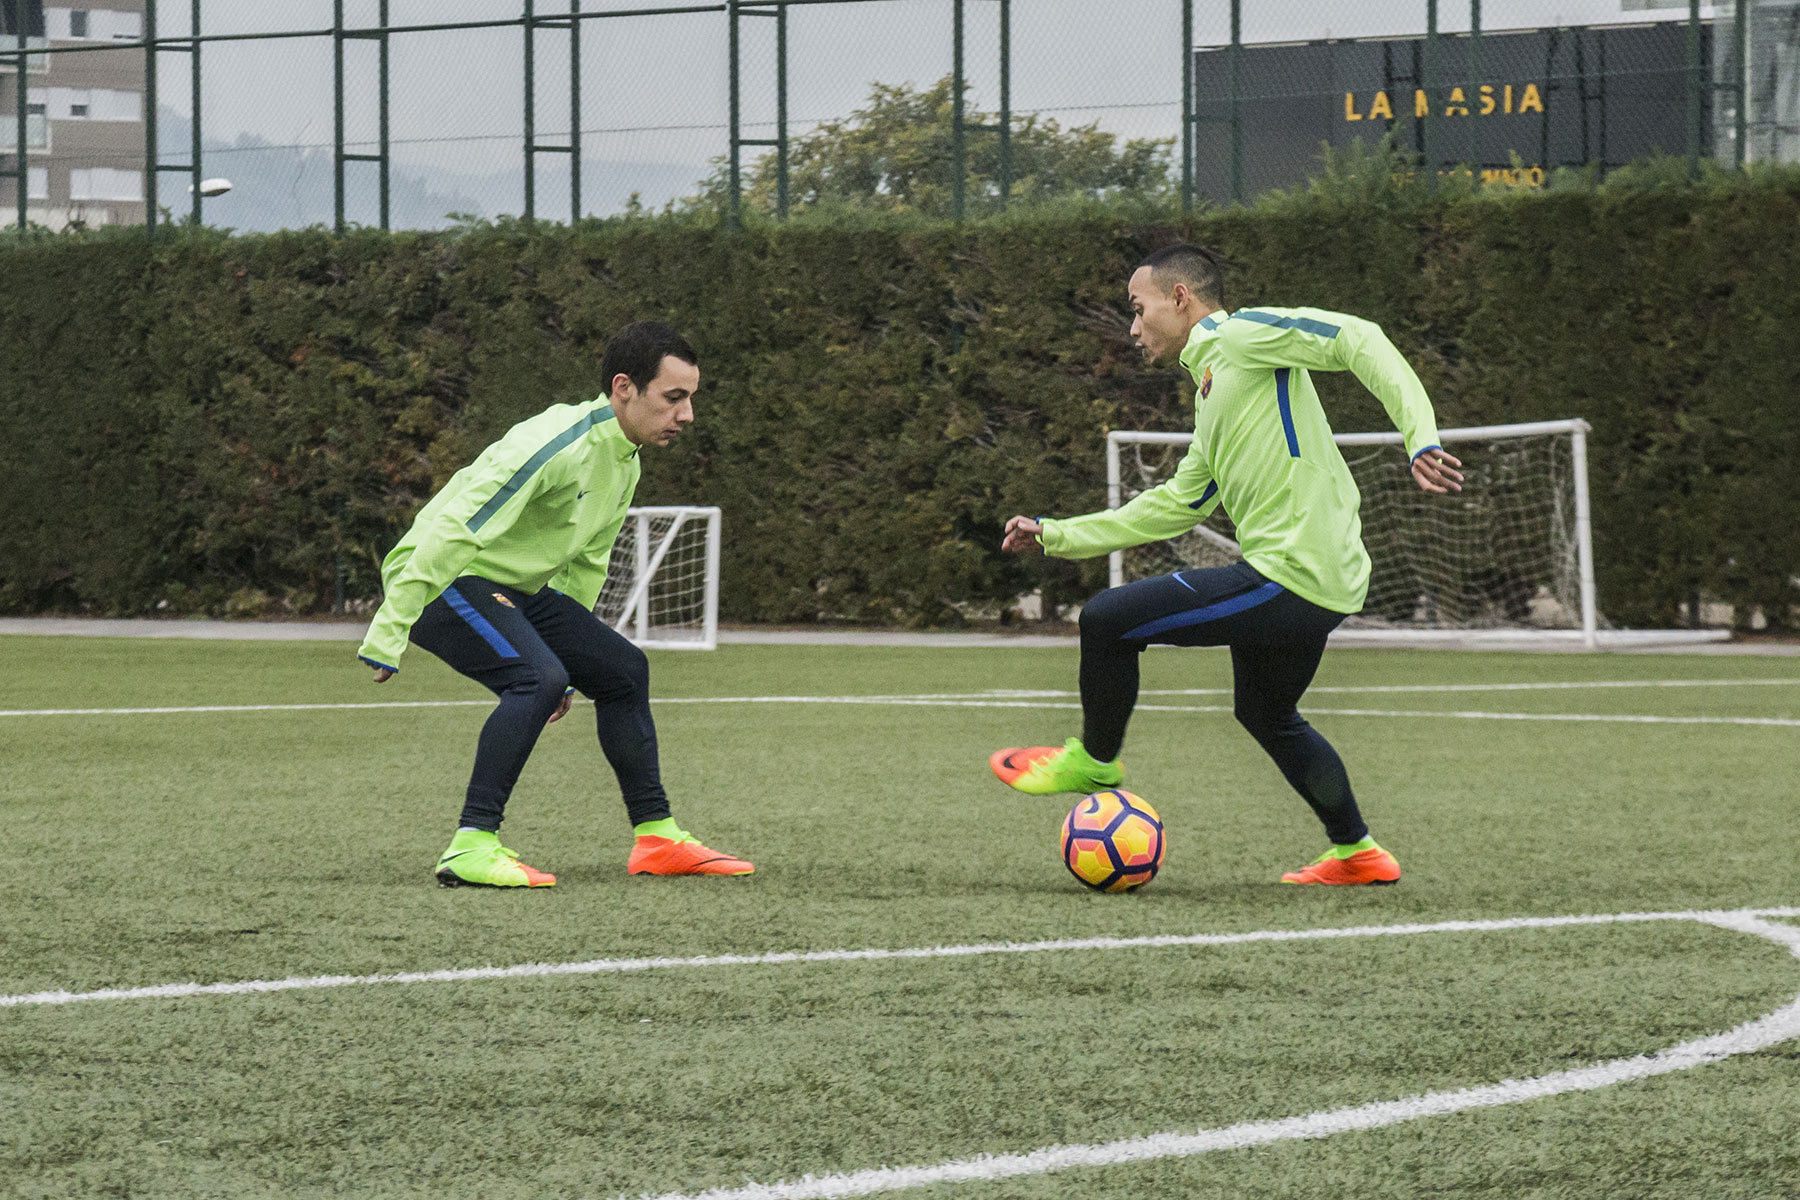 test-chaussures-football-Nike-Hypervenom-Phantom-3-DF-img11